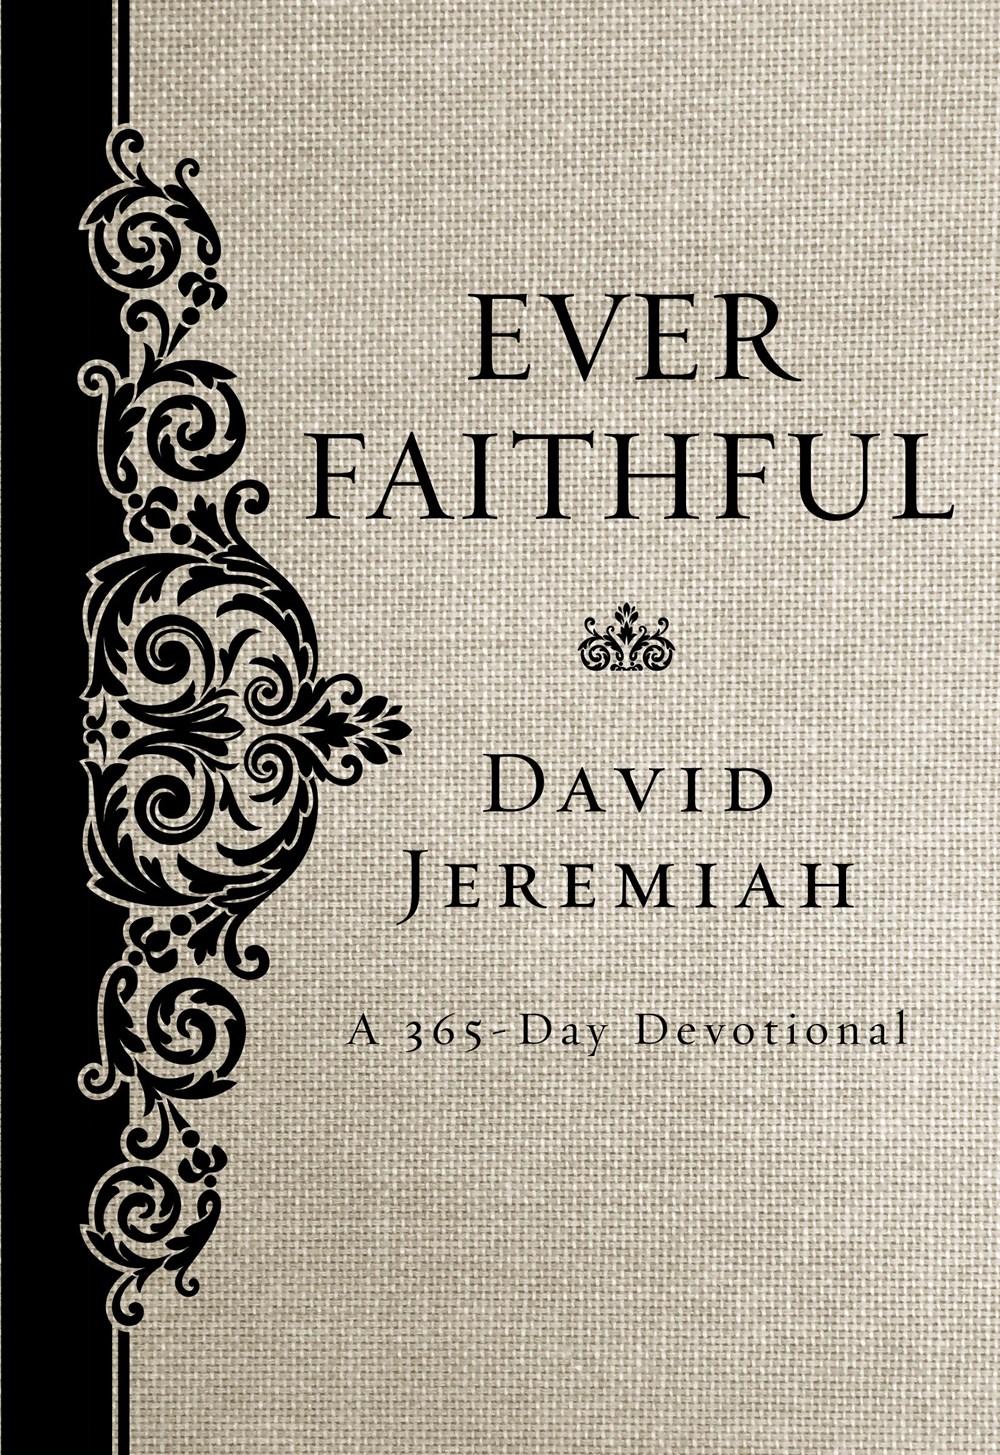 Dr. David Jeremiah - Ever Faithful 365-Day Devotional